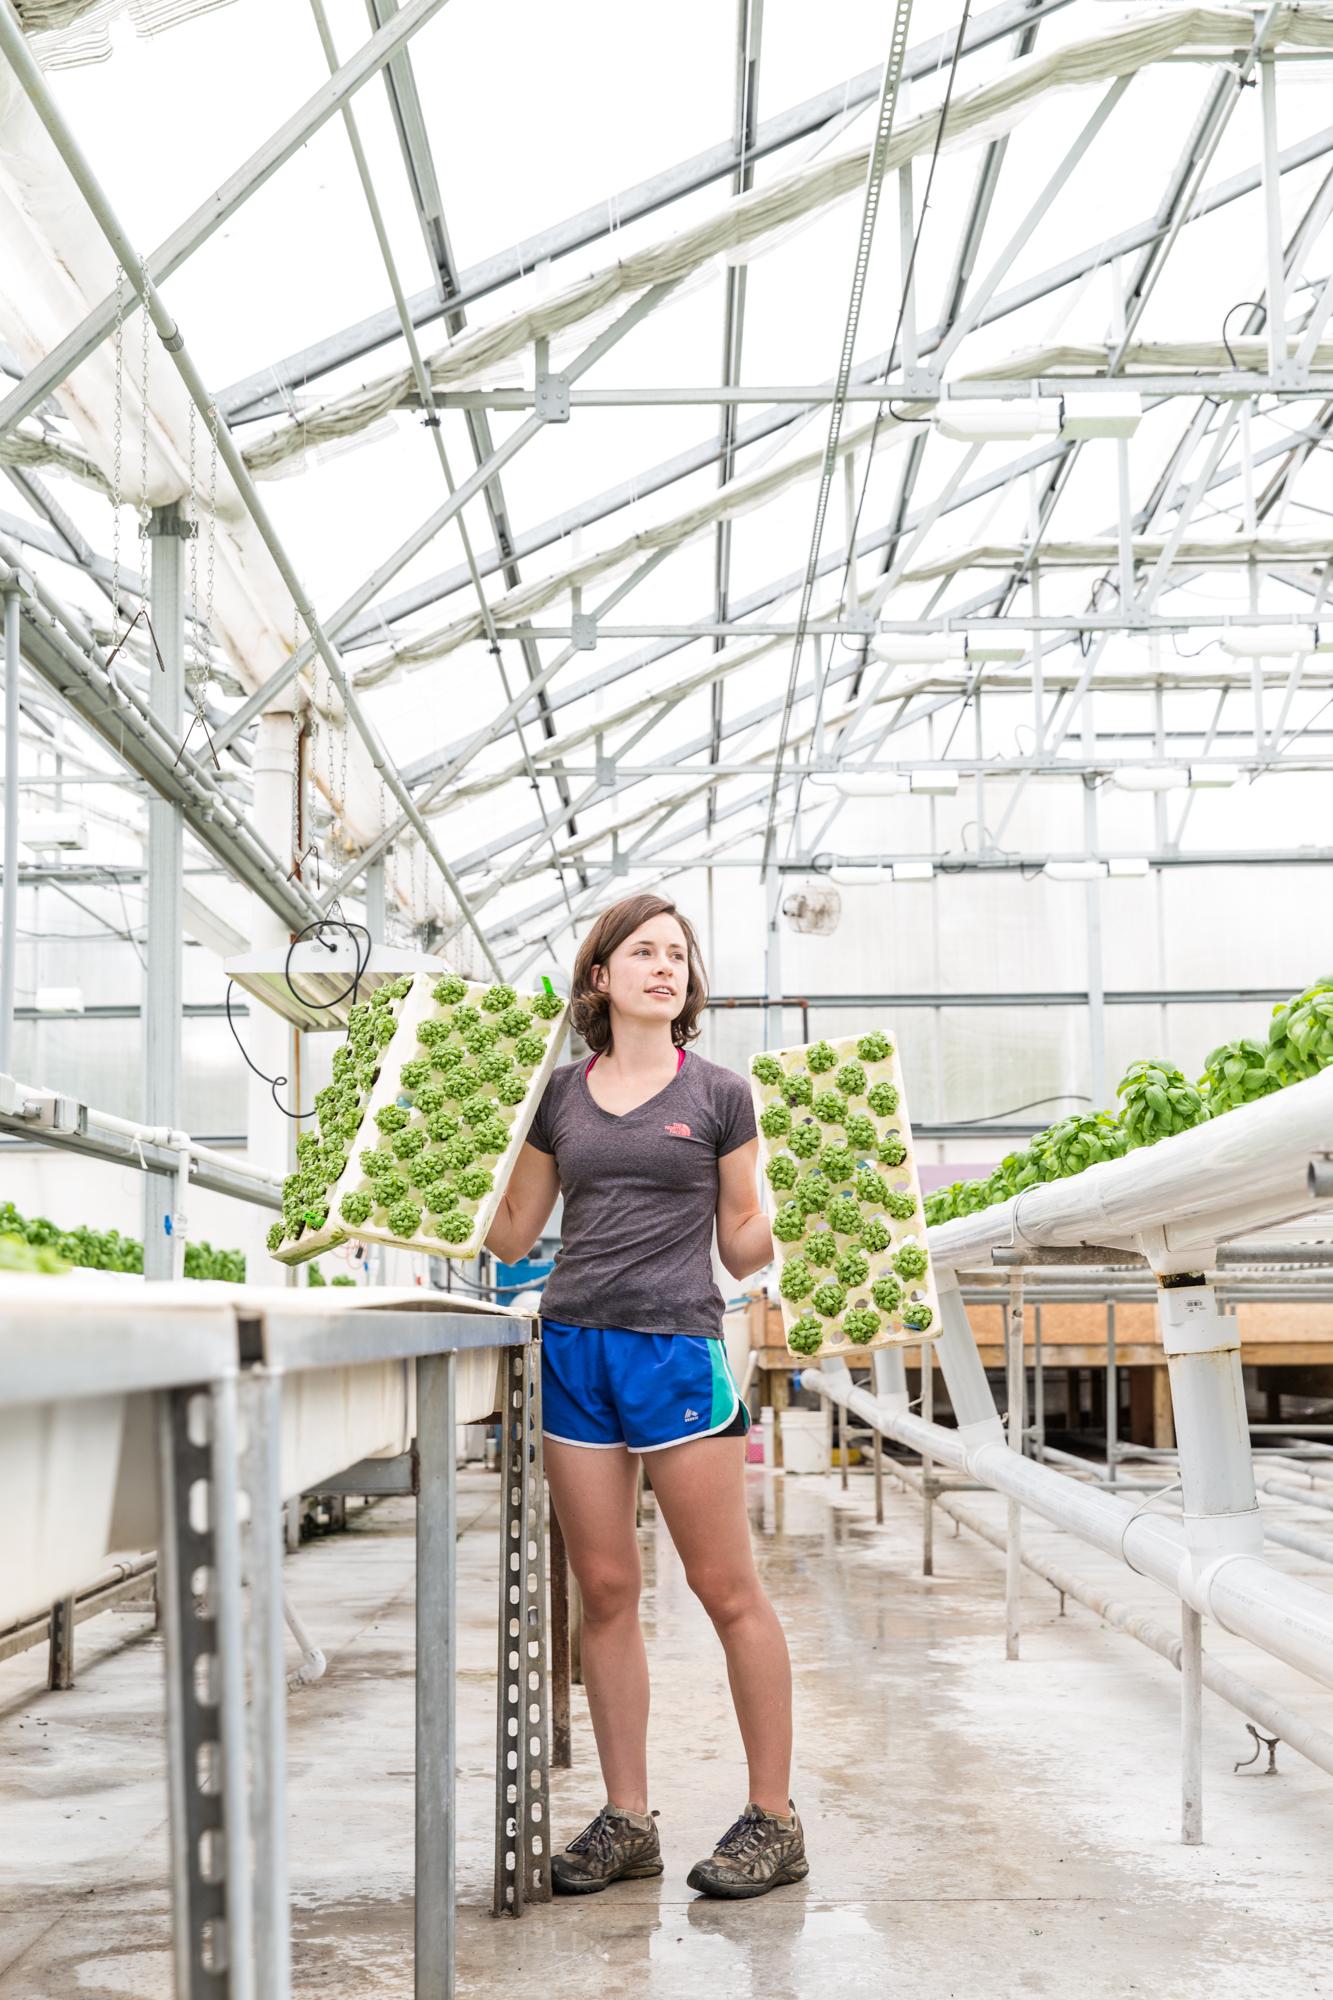 GRybus-Blog-Fresh-Greenhouses-9129.jpg